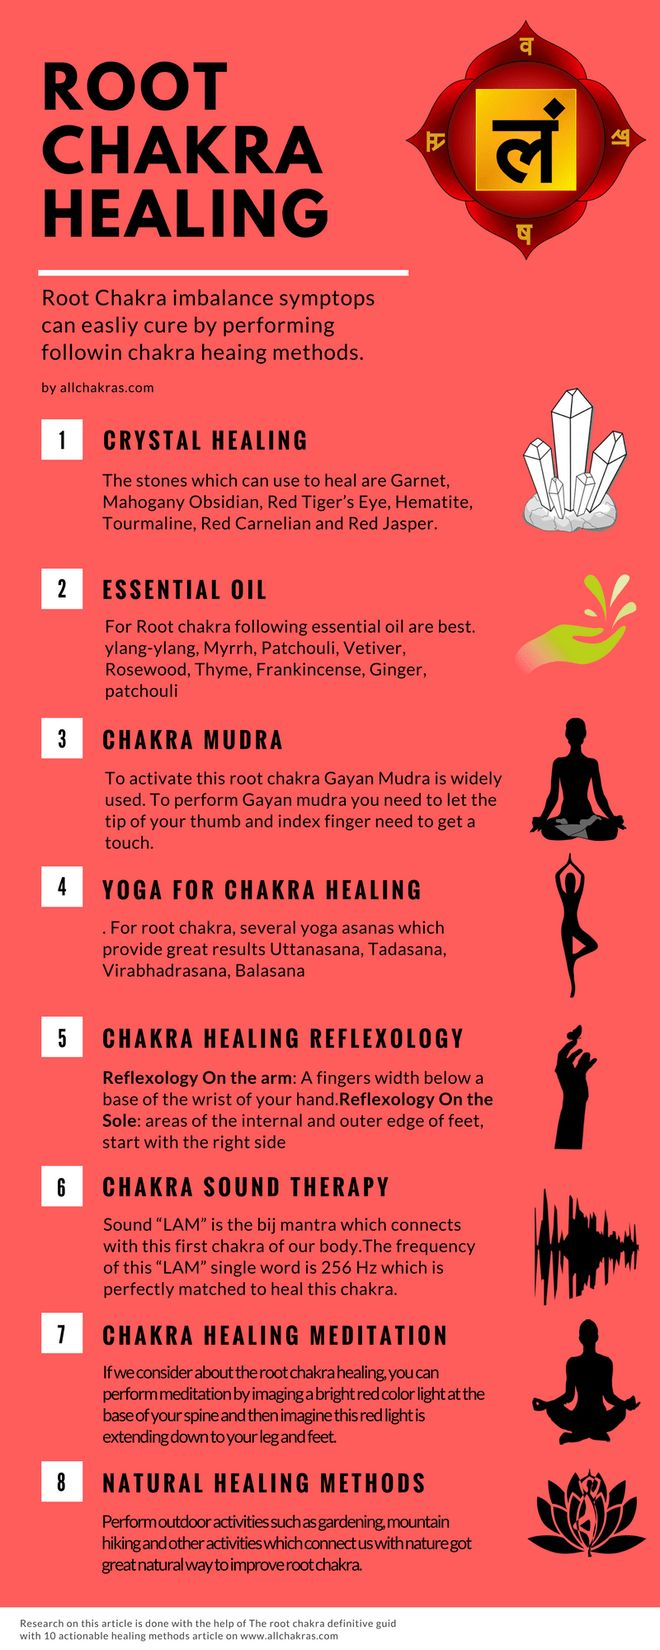 The #Rootchakra Definitive Guide With 10 Actionable Healing Methods #chakrahealing #allchakra